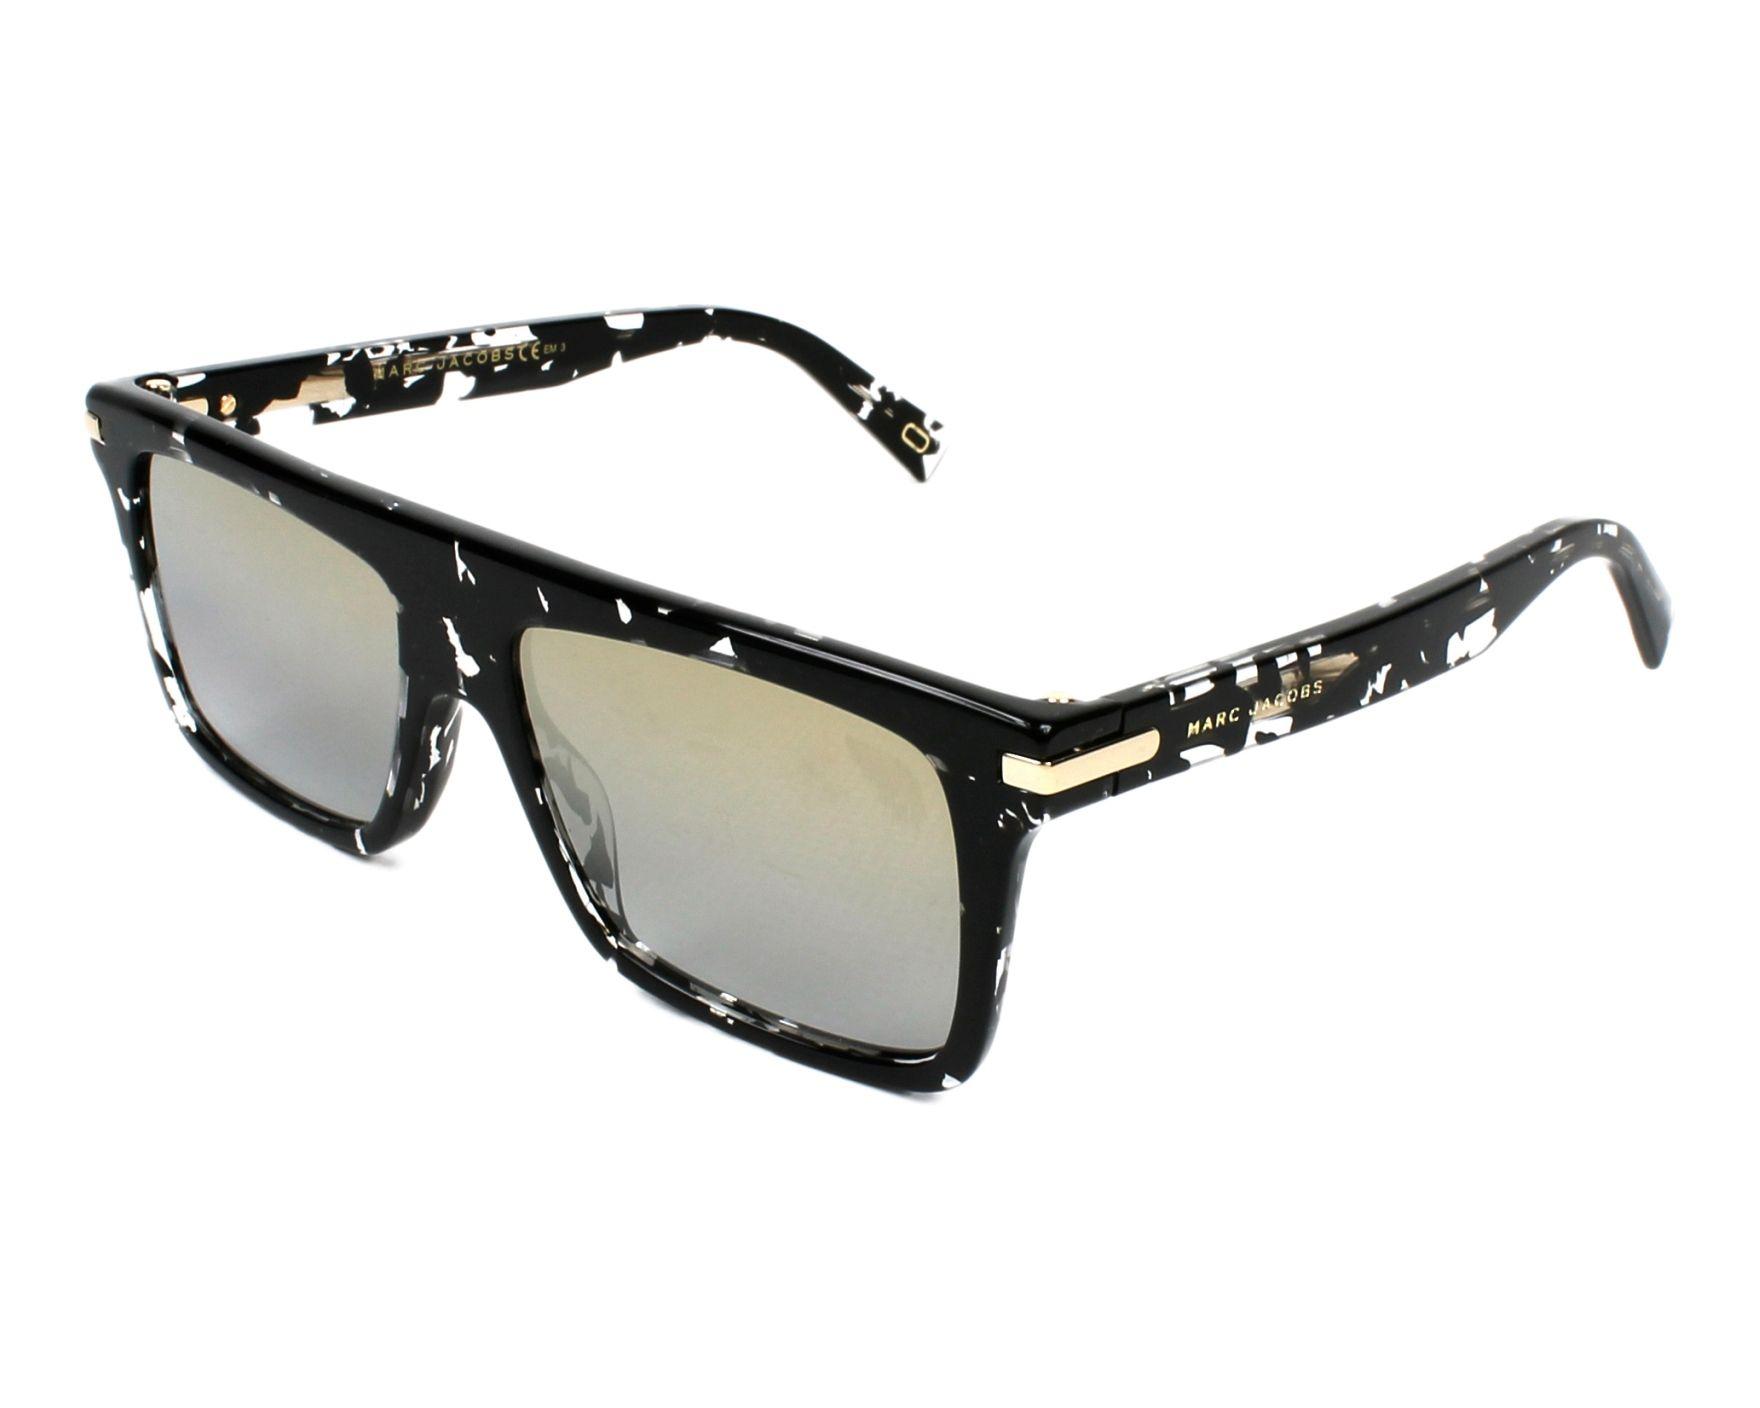 d80f29a750cca Sunglasses Marc Jacobs MARC-186-S 9WZ 9F 54-16 Black Crystal